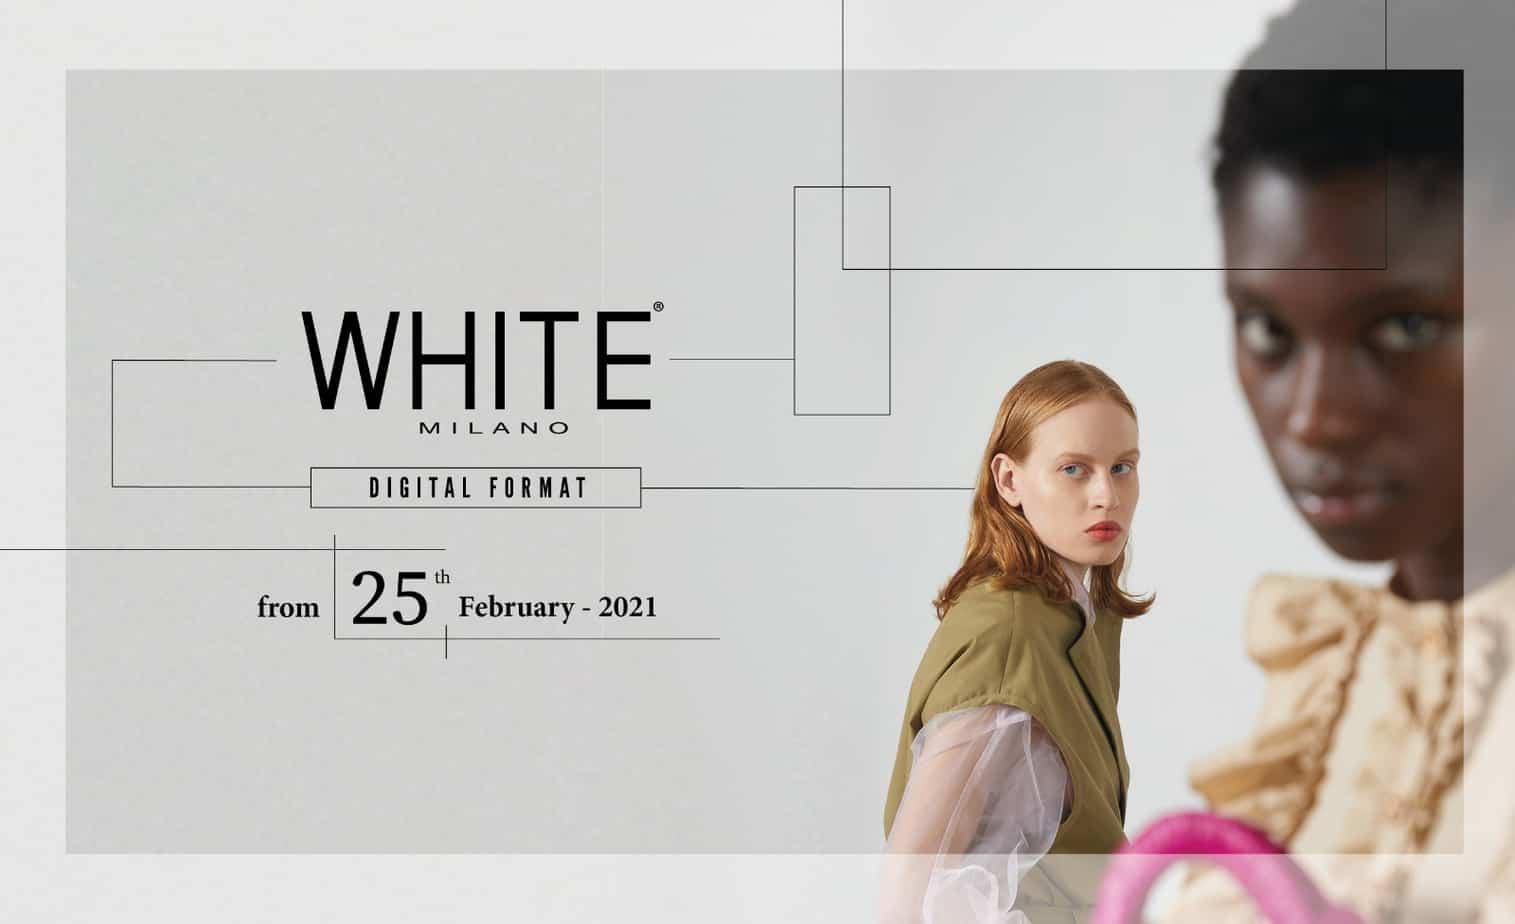 Fashion Week a Milano dal 25 febbraio torna White con oltre 200 brand